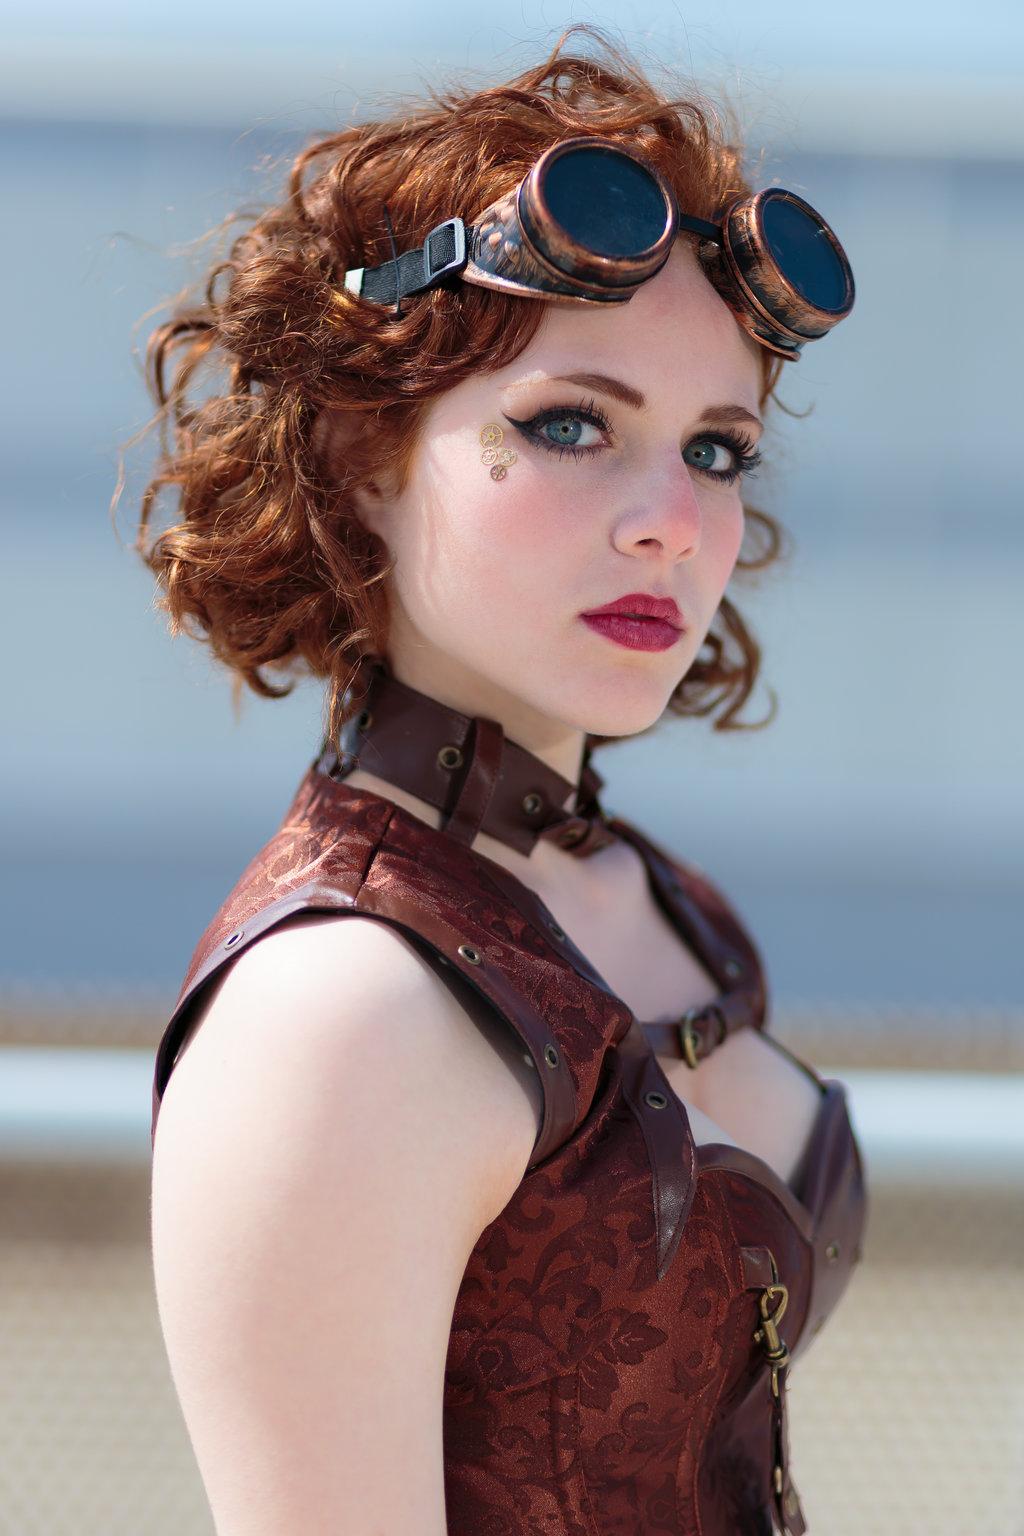 Rockabilly style vestimentaire femme - Steampunk style vestimentaire ...